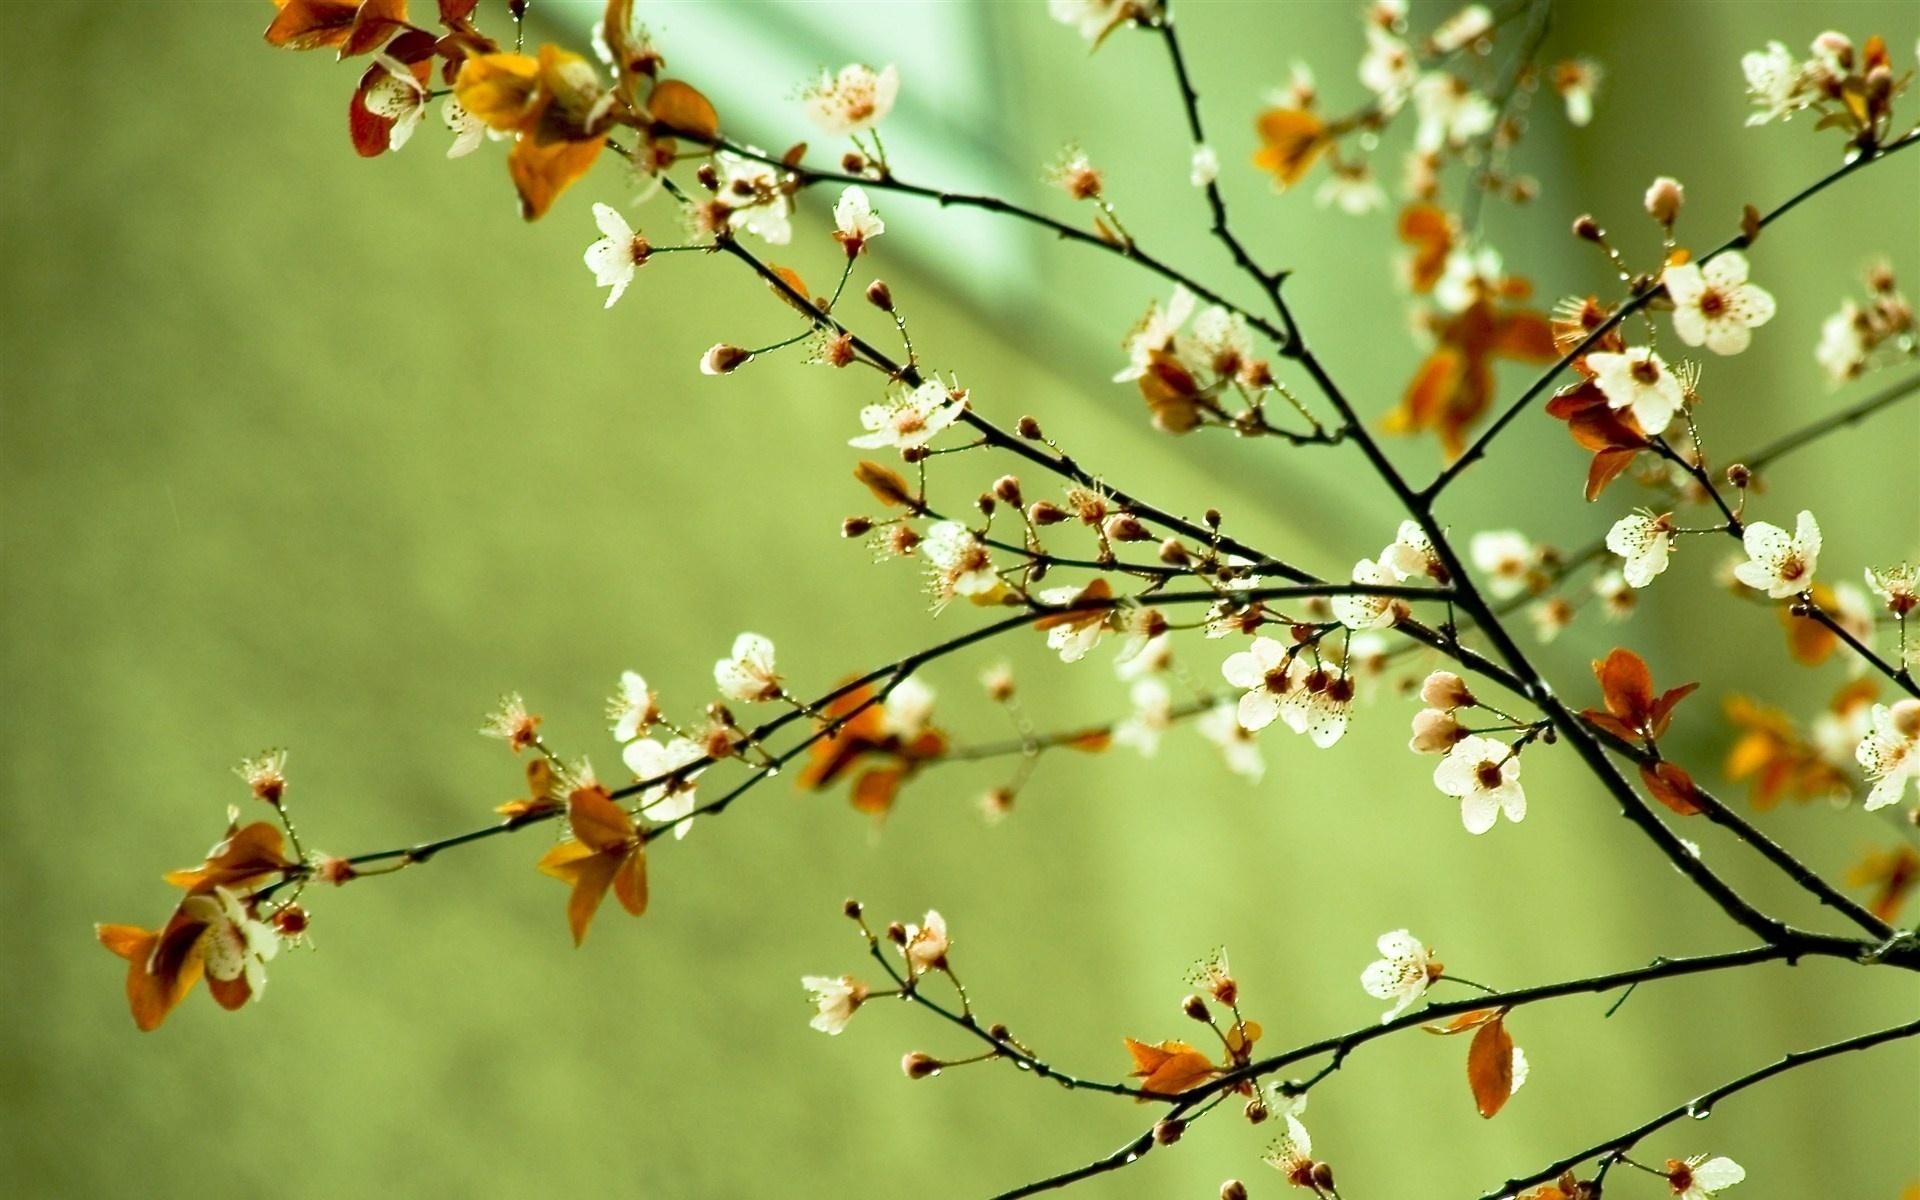 springtime hd backgrounds